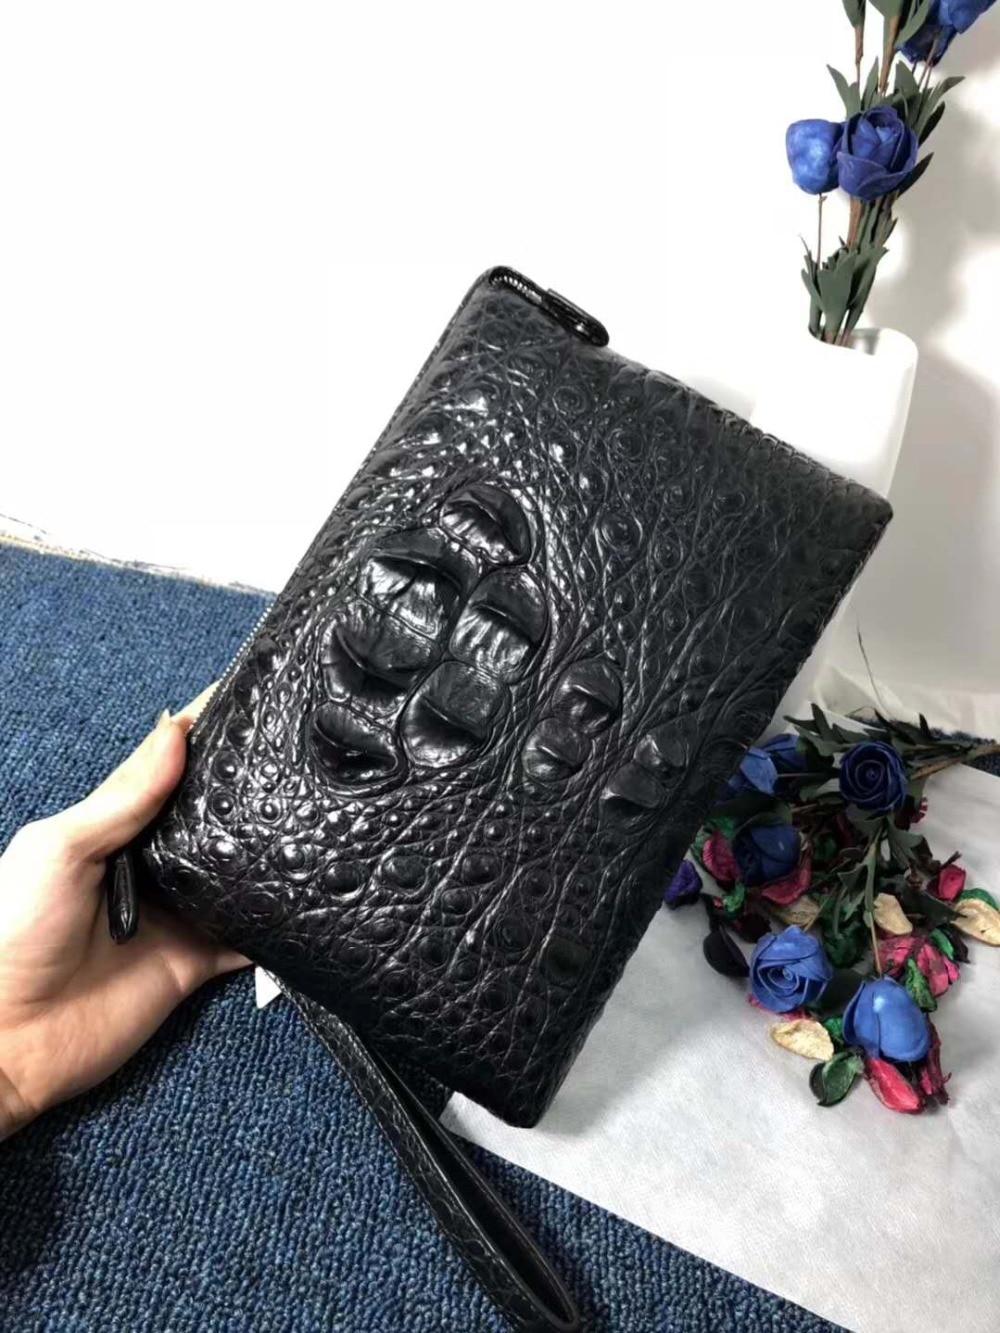 100% real crocodile leather skin wallet and purse alligator head skin black color big size men clutch holder excellent quality